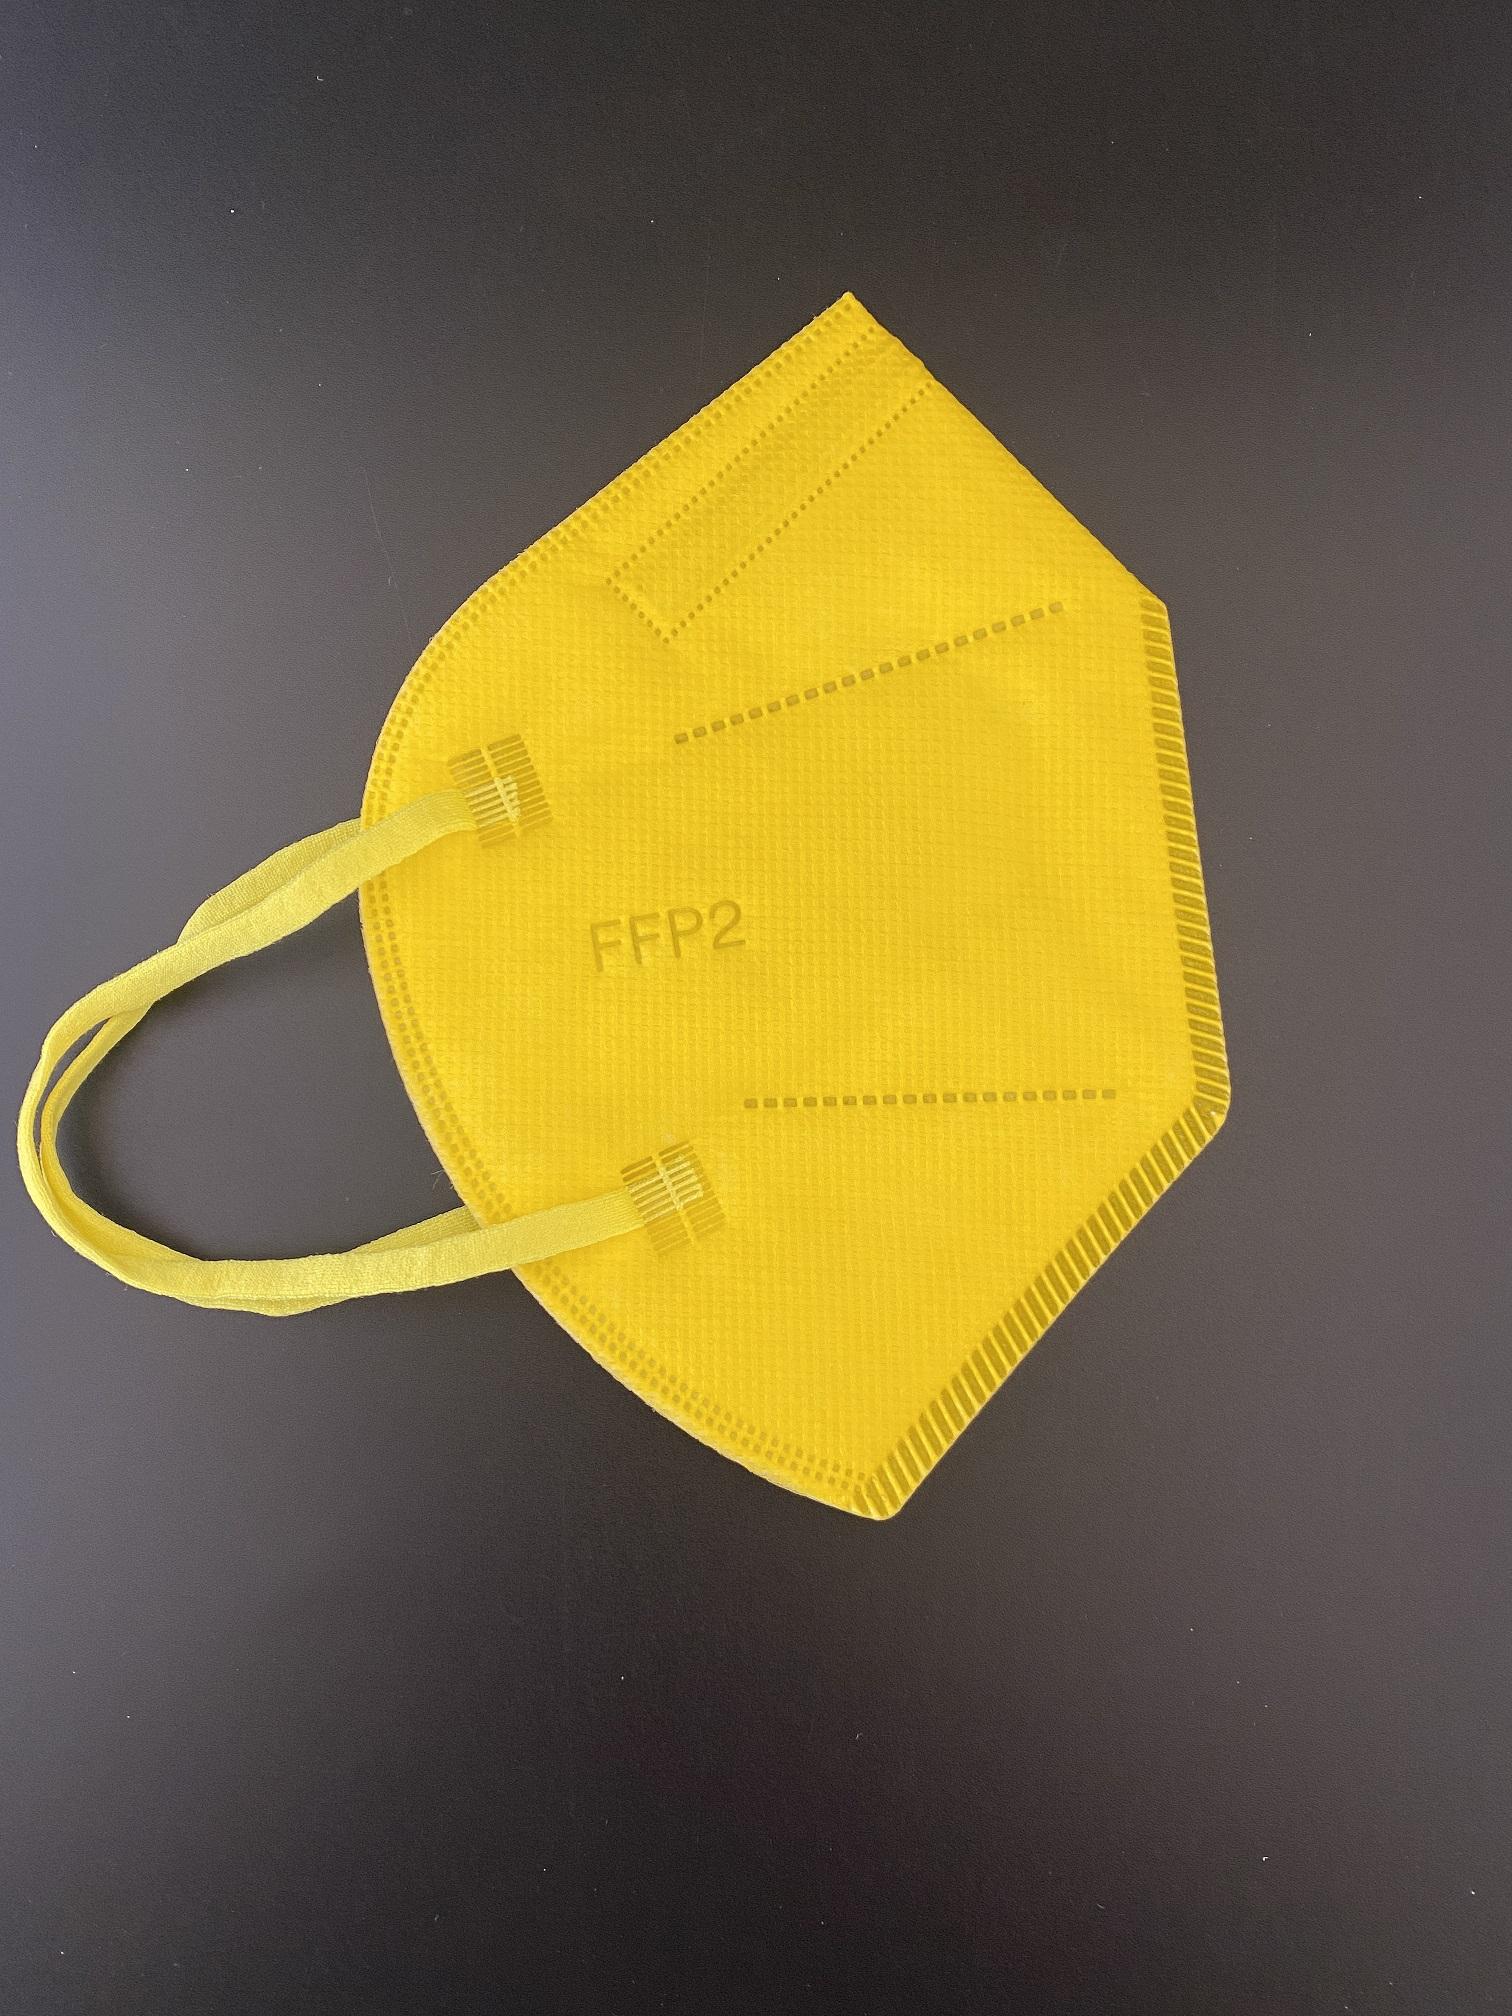 CTPL-0020 FFP2 NR Maske CE0598 5-lagig Gelb